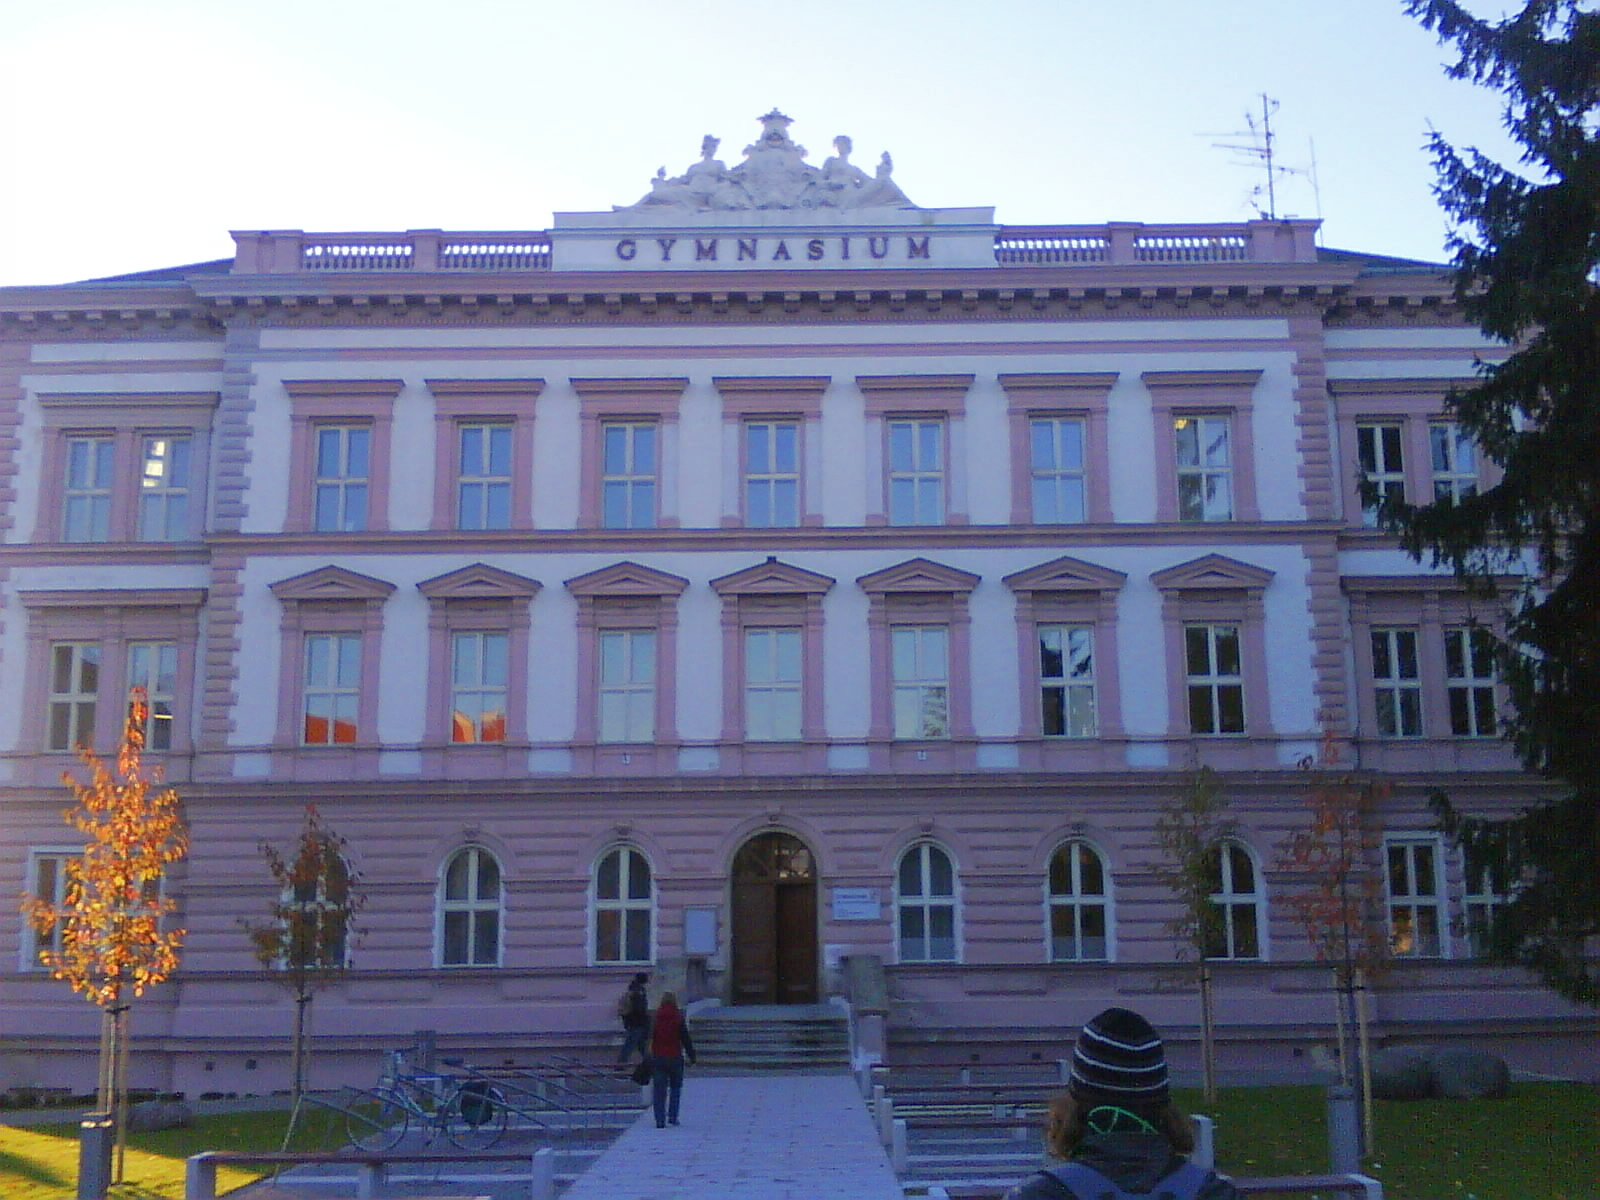 http://upload.wikimedia.org/wikipedia/commons/3/32/Gymn%C3%A1zium_Dr._Karla_Polesn%C3%A9ho_Znojmo.JPG